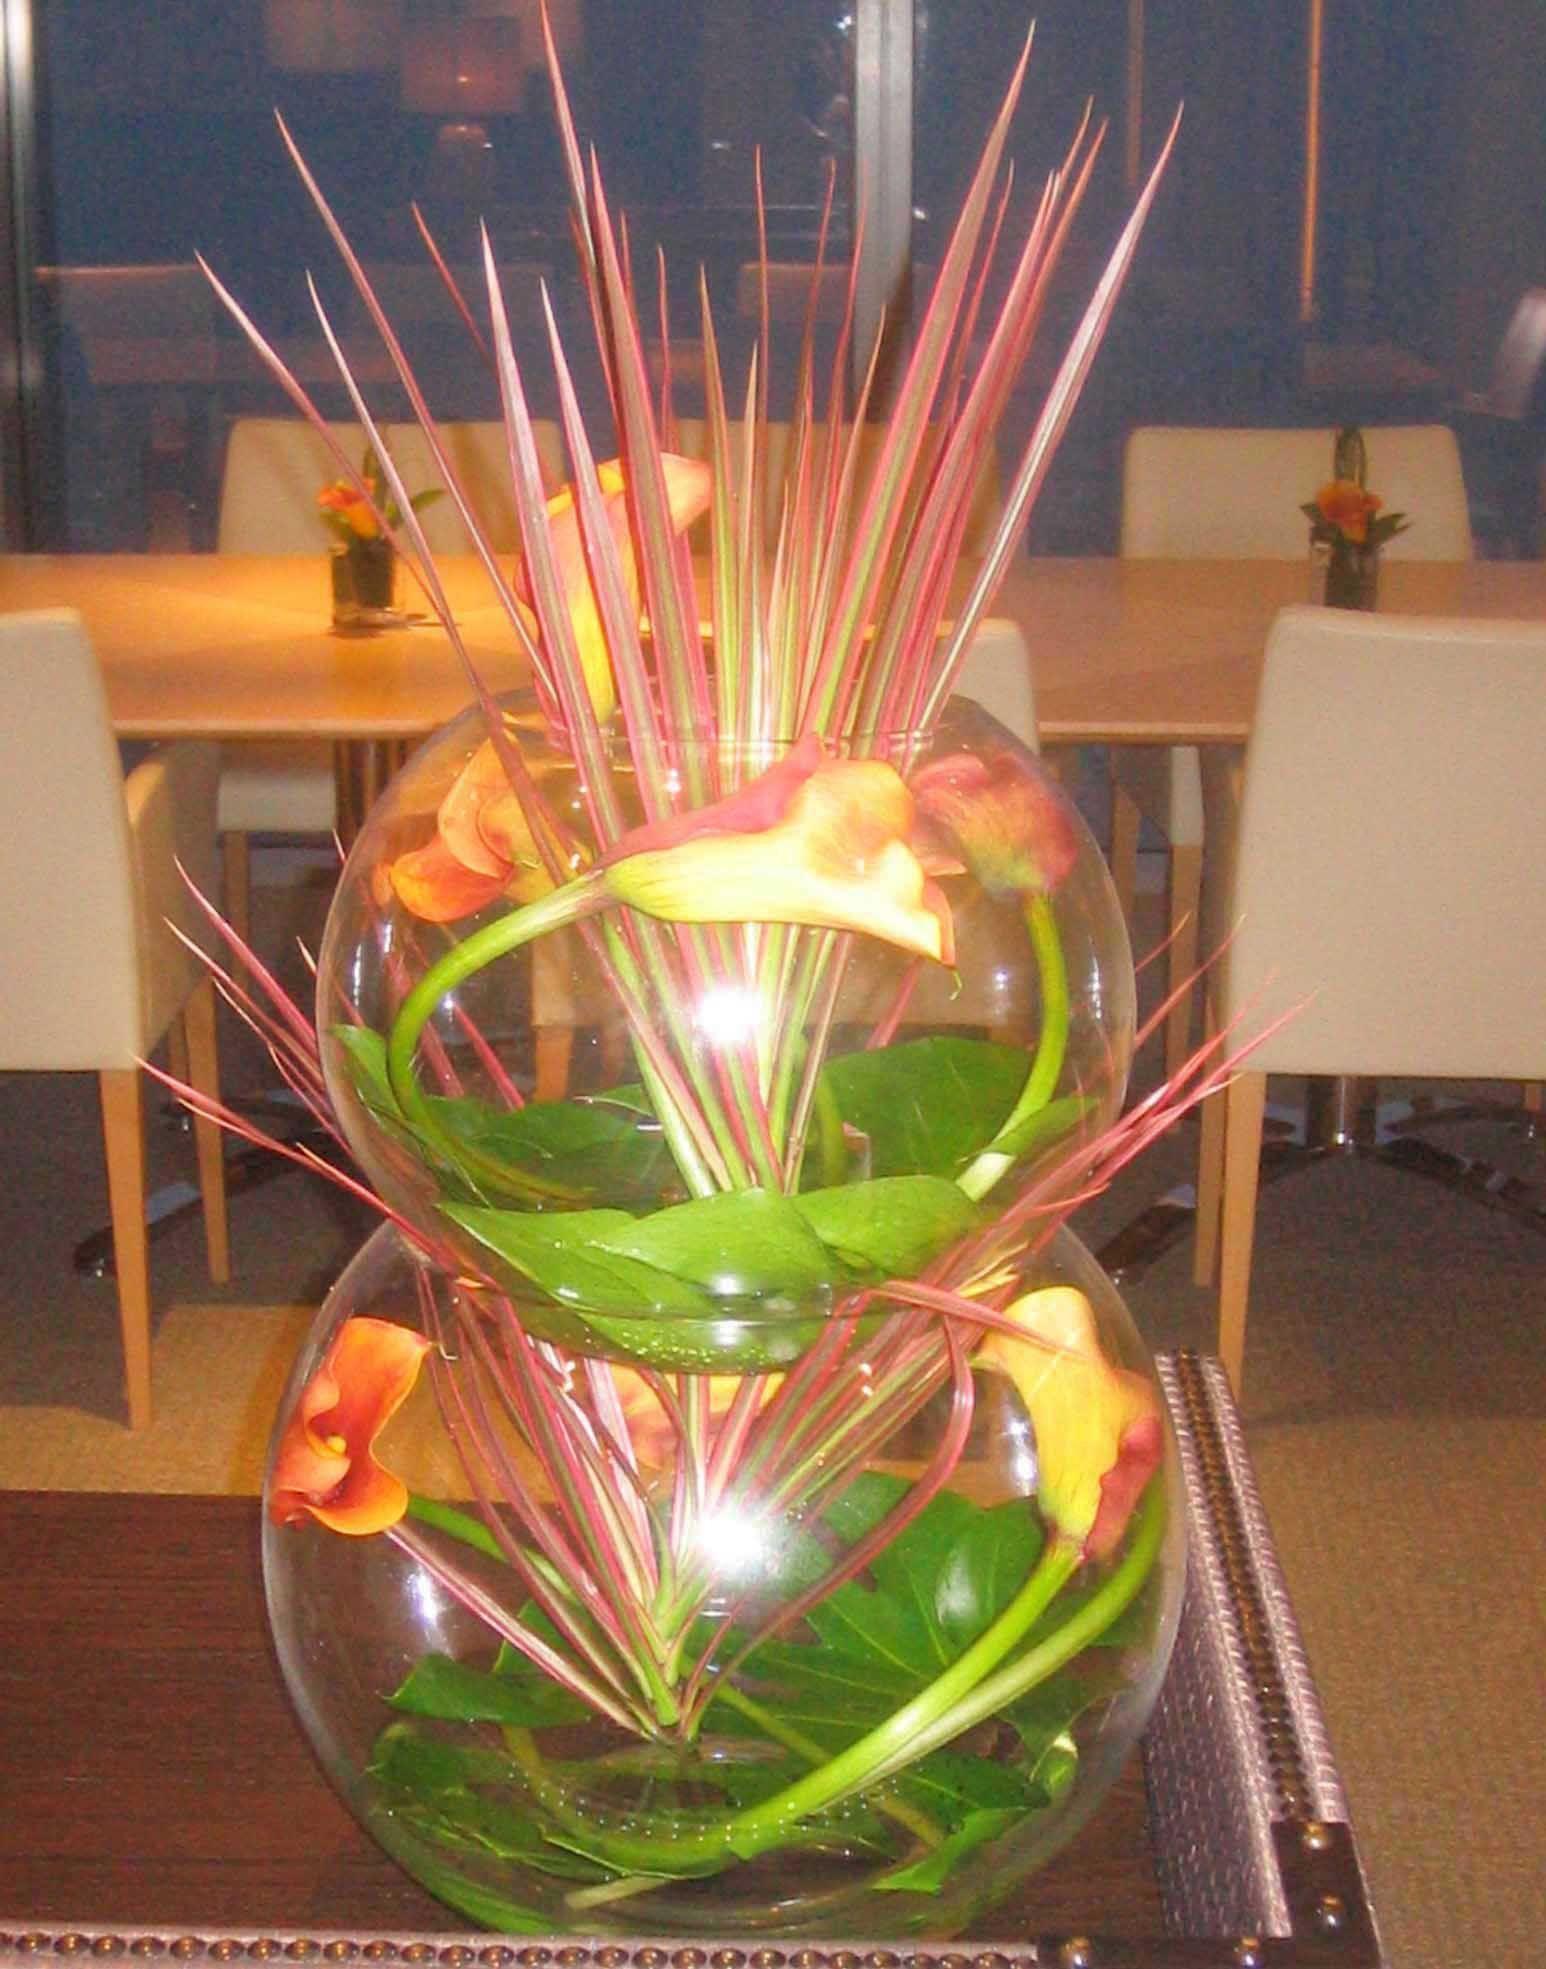 white glass bowl vase of flower arrangement in vase awesome 34 od gold fish bowl with orange pertaining to flower arrangement in vase awesome 34 od gold fish bowl with orange calla lily incased inside